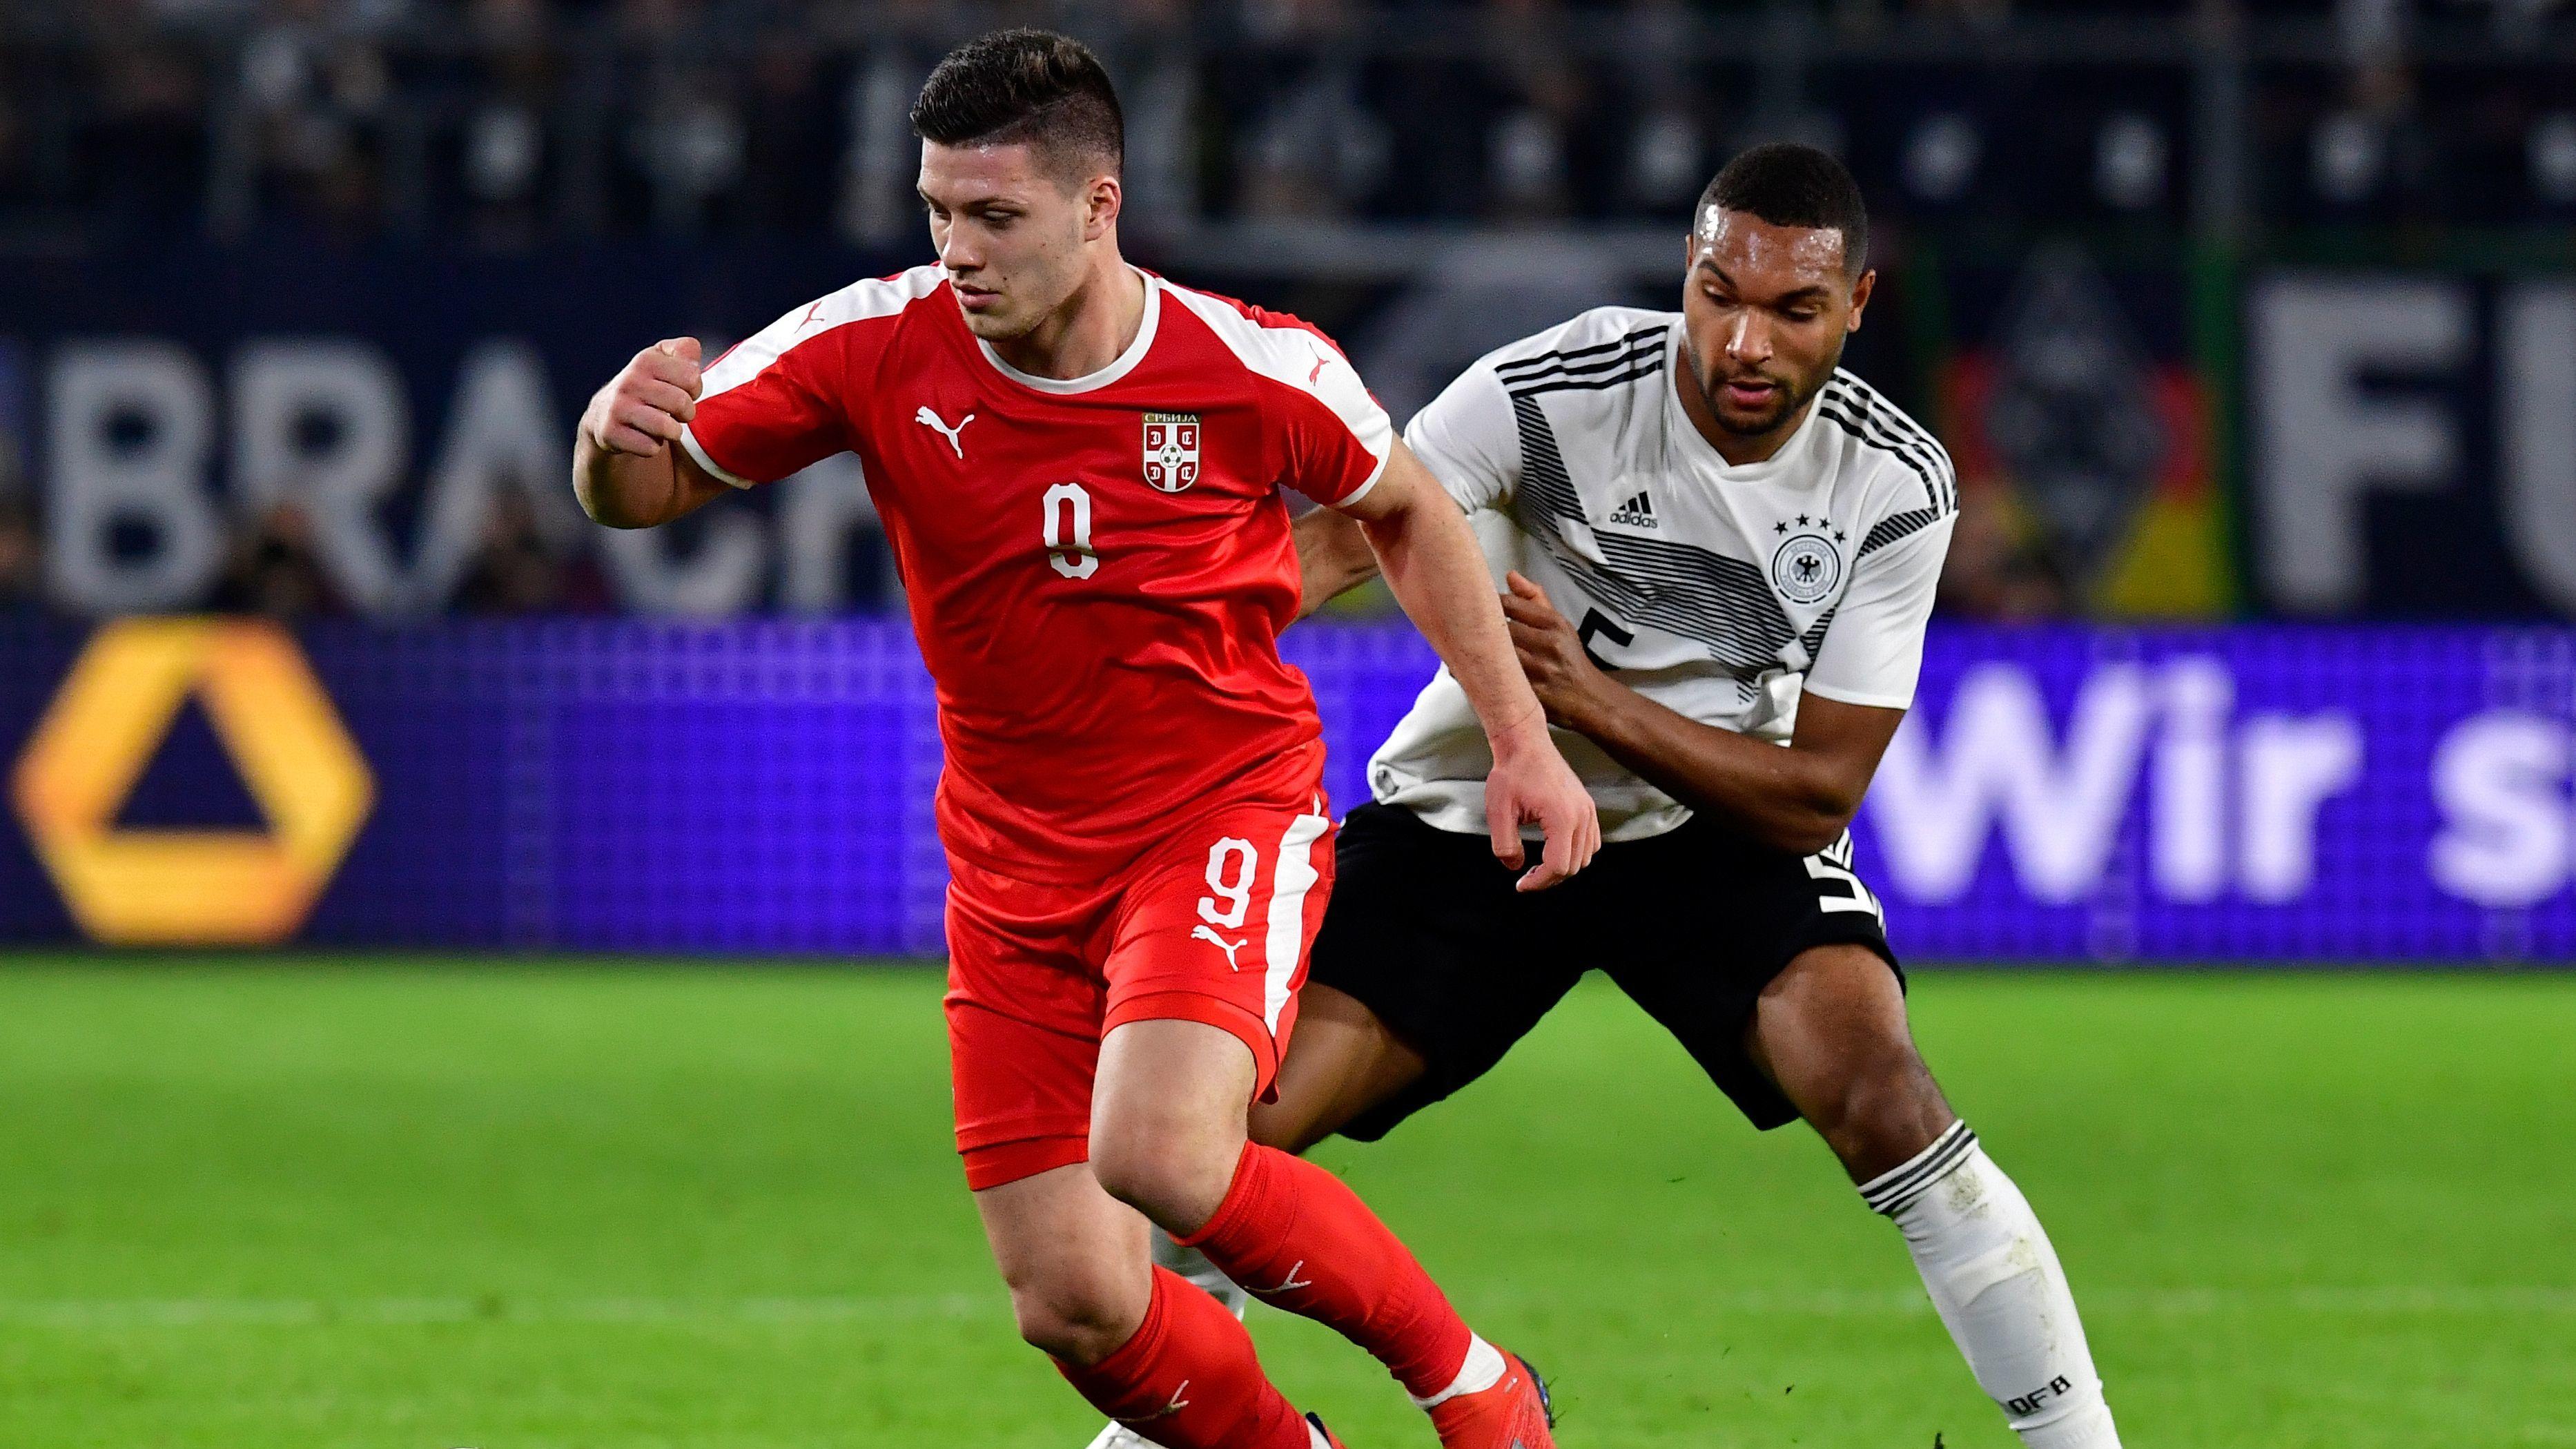 Jovic & Co.: Serbiens Stärken, Serbiens Schwächen | Nationalmannschaft | U21 - kicker